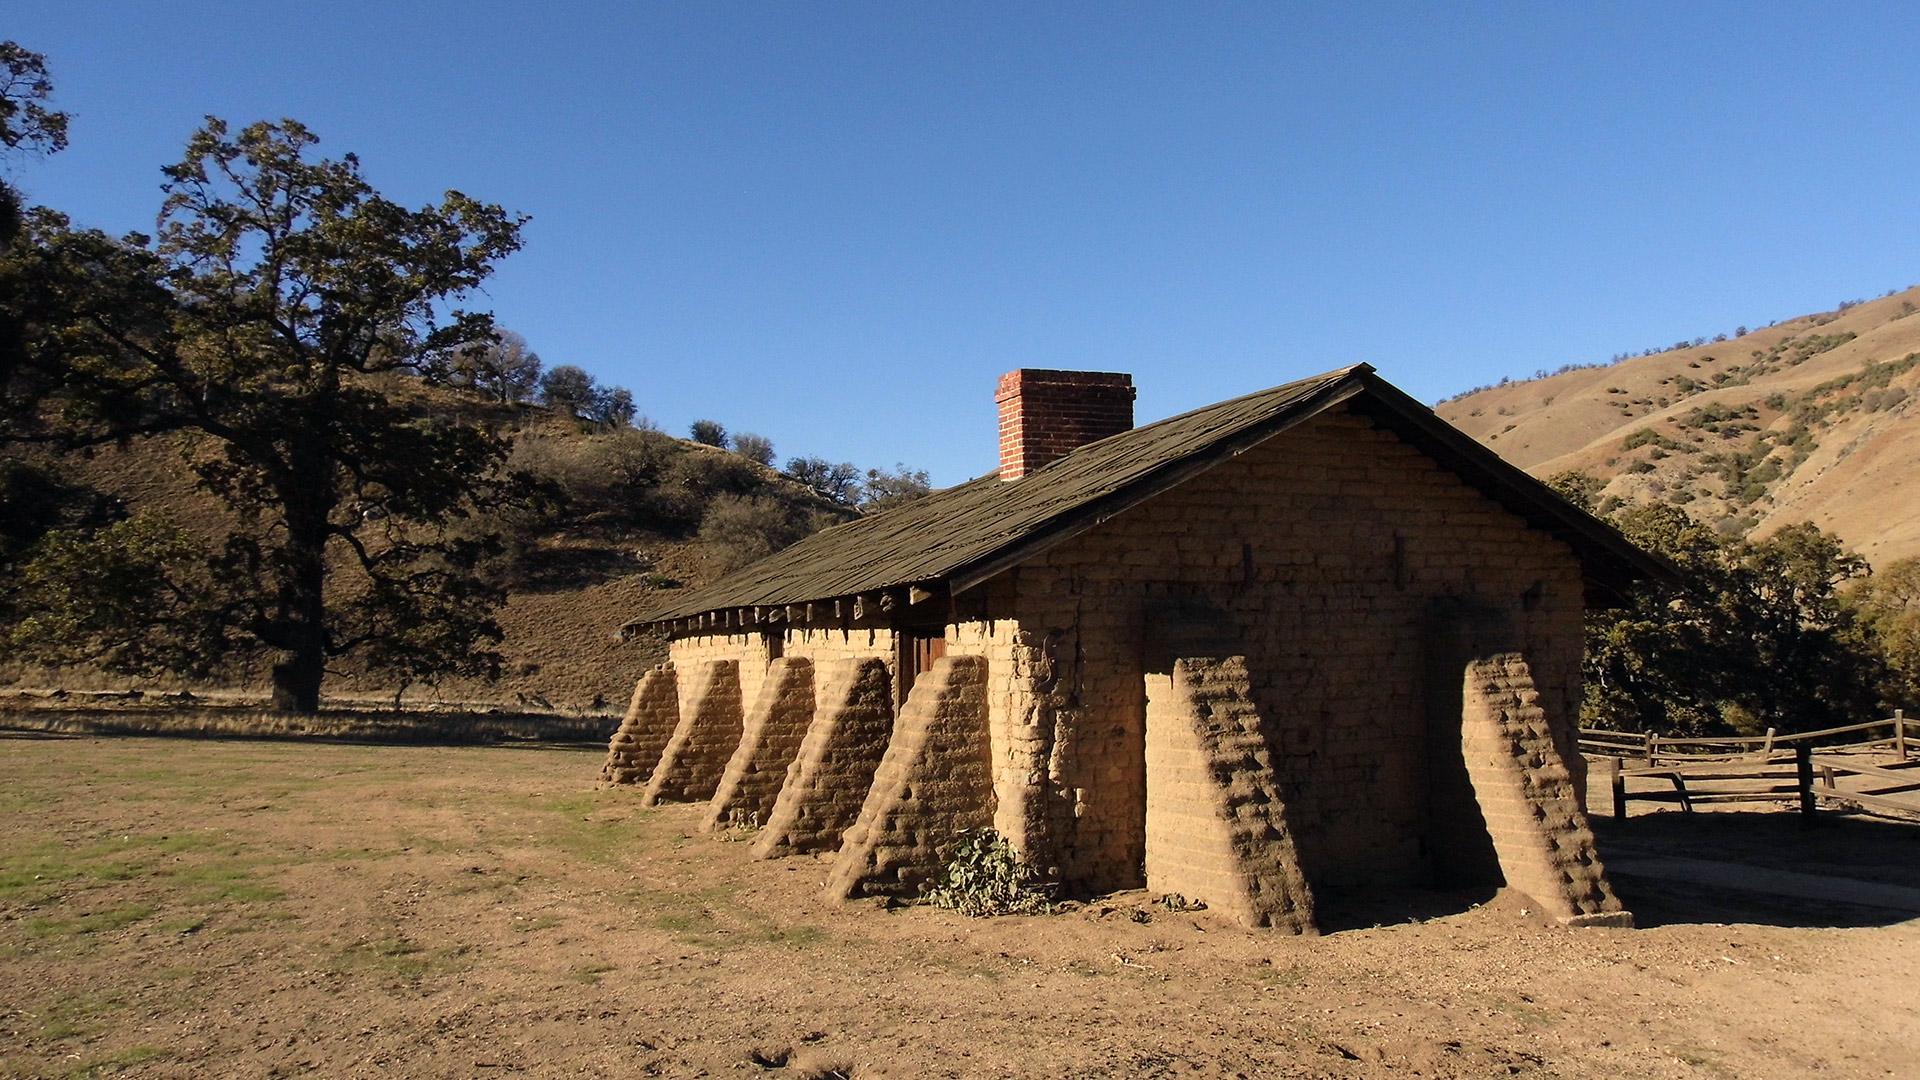 Fort Tejon State Historic Park